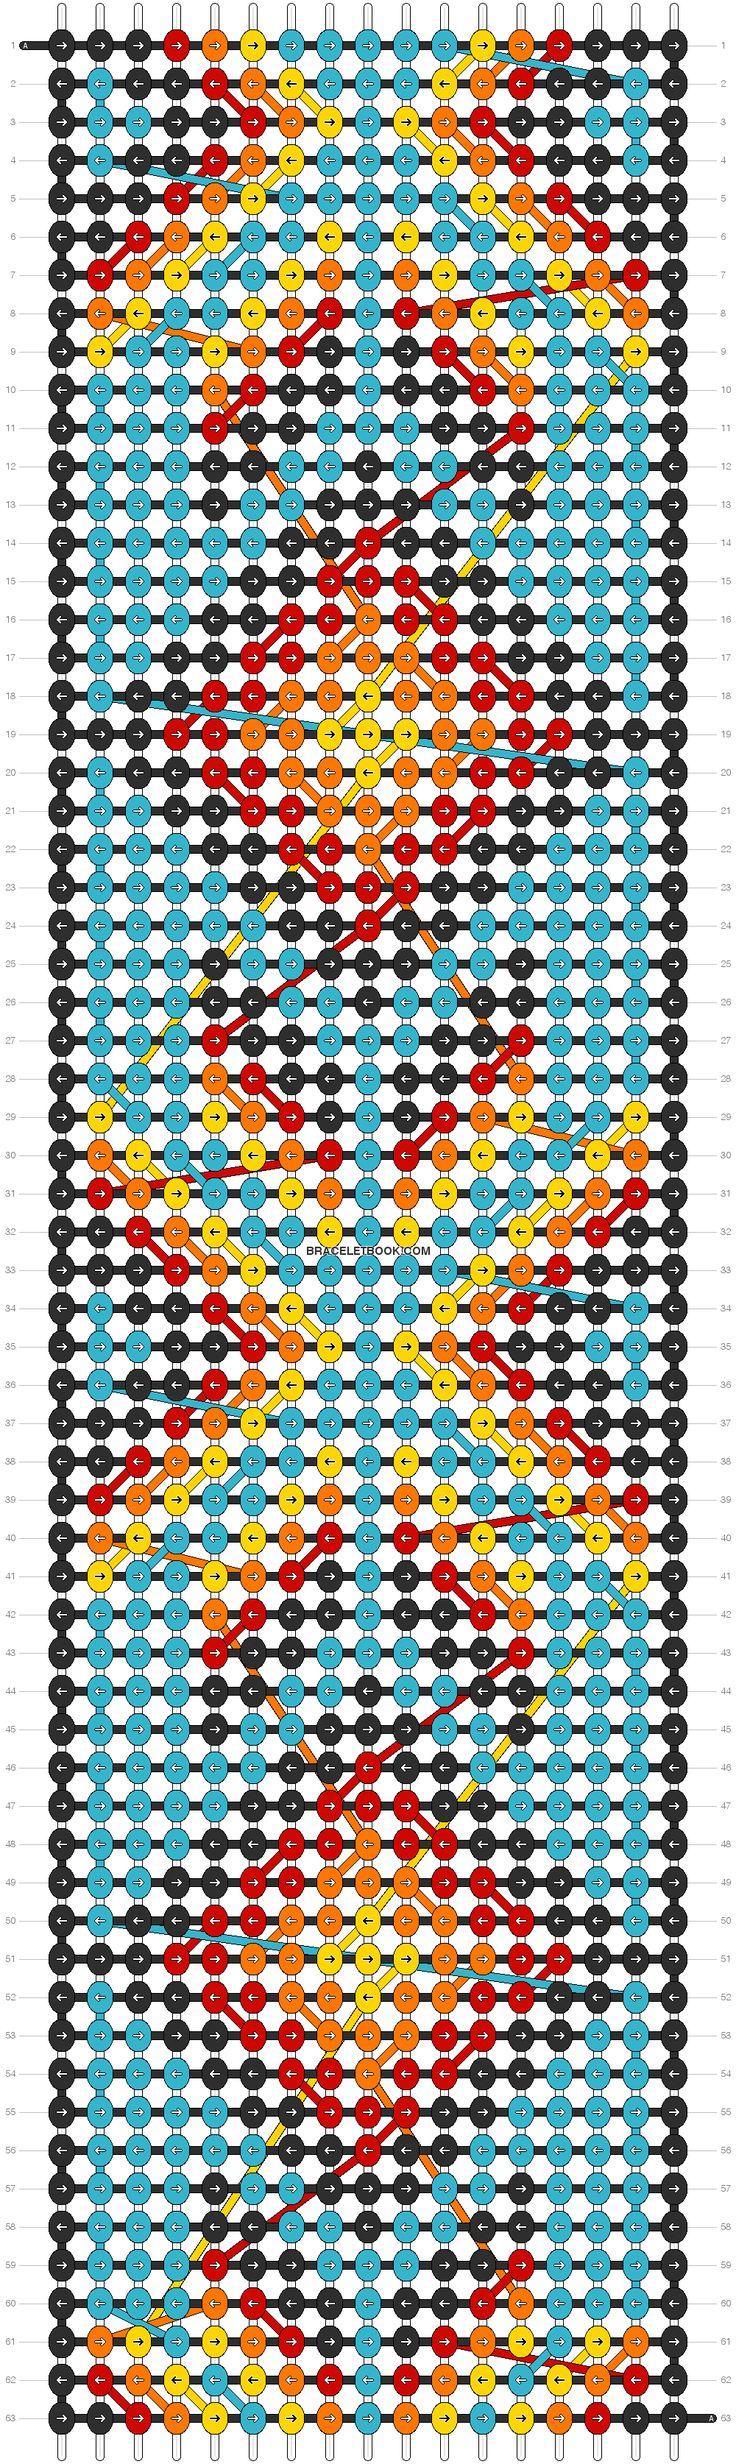 Native American Friendship Bracelet Pattern  Google Search